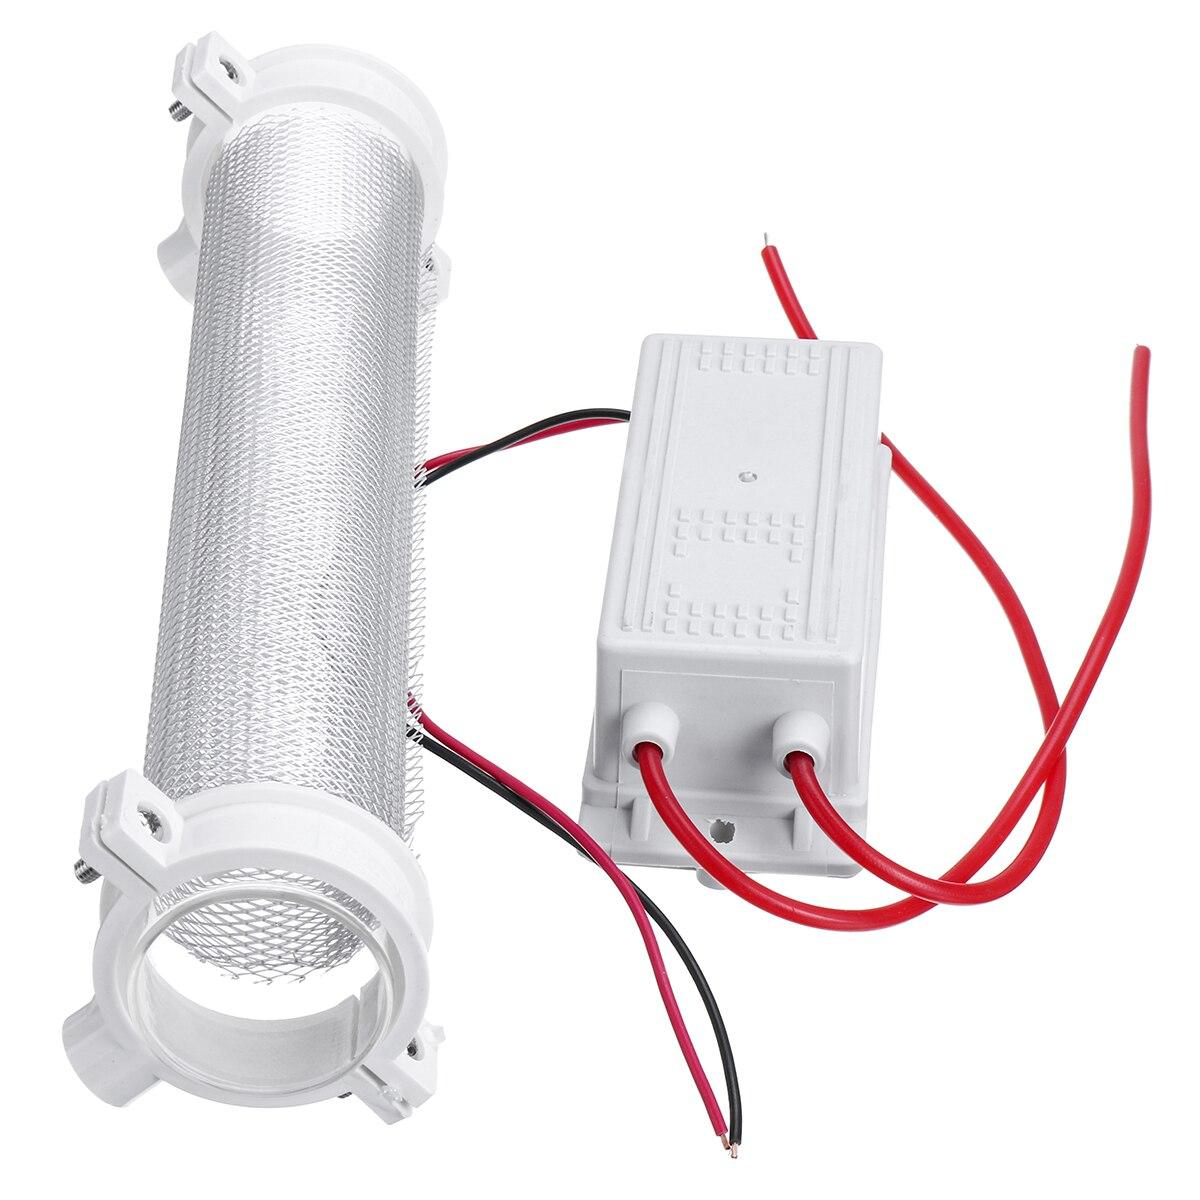 AC220V 10G/15G/20G أنبوب السيليكا مولد أوزون مولد الأوزون أنبوب لتنقية الهواء منقي هواء مزيل الروائح لتقوم بها بنفسك